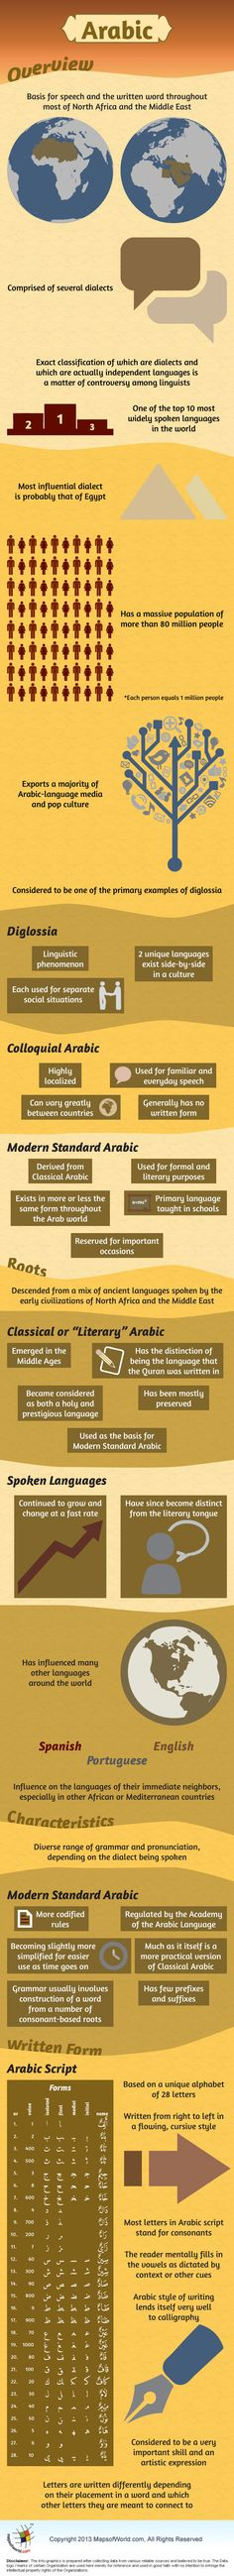 Cv Samples Arabic English Cv Template Word In Arabic Cv